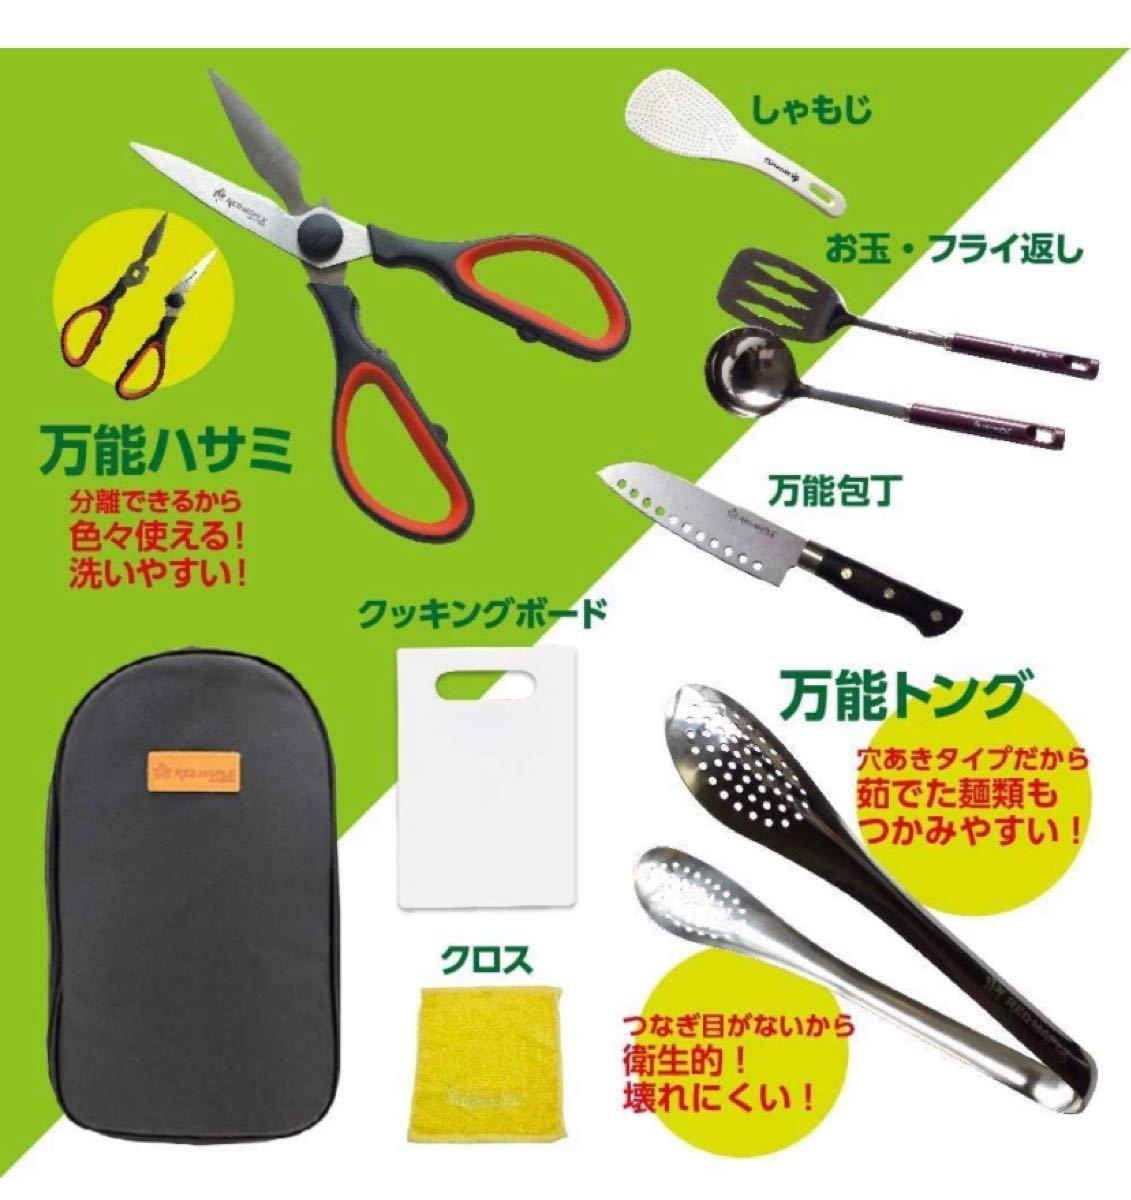 SakuraZen バーベキュー 調理器具 BBQ セット キャンプ アウトドア 防災 9ピース 男女兼用